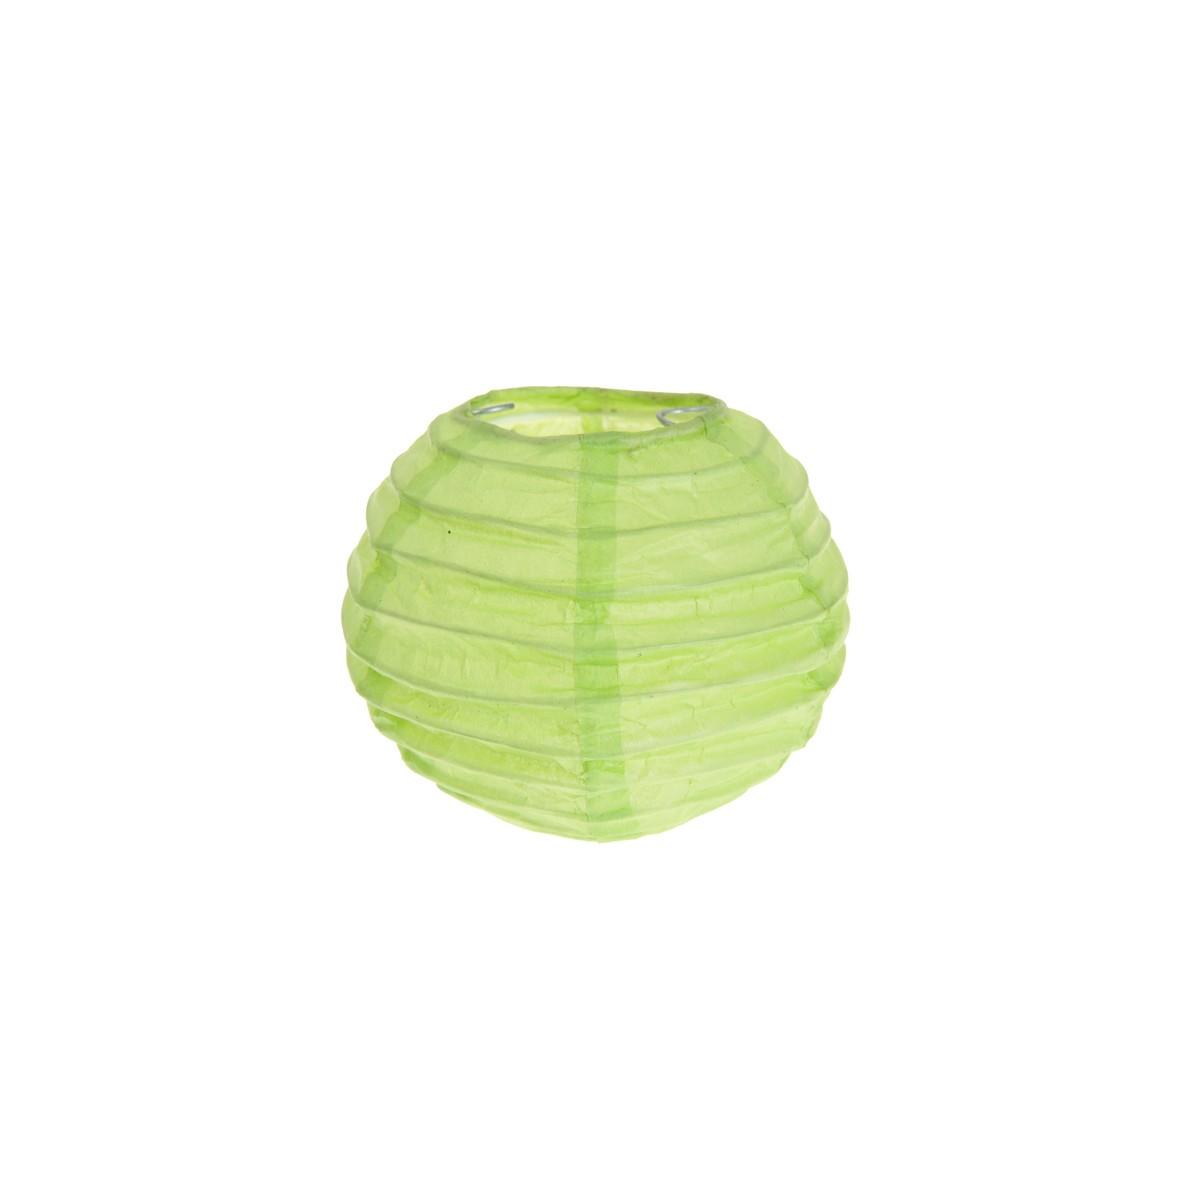 2 x Mini lanterne Papier 7.5cm - Vert